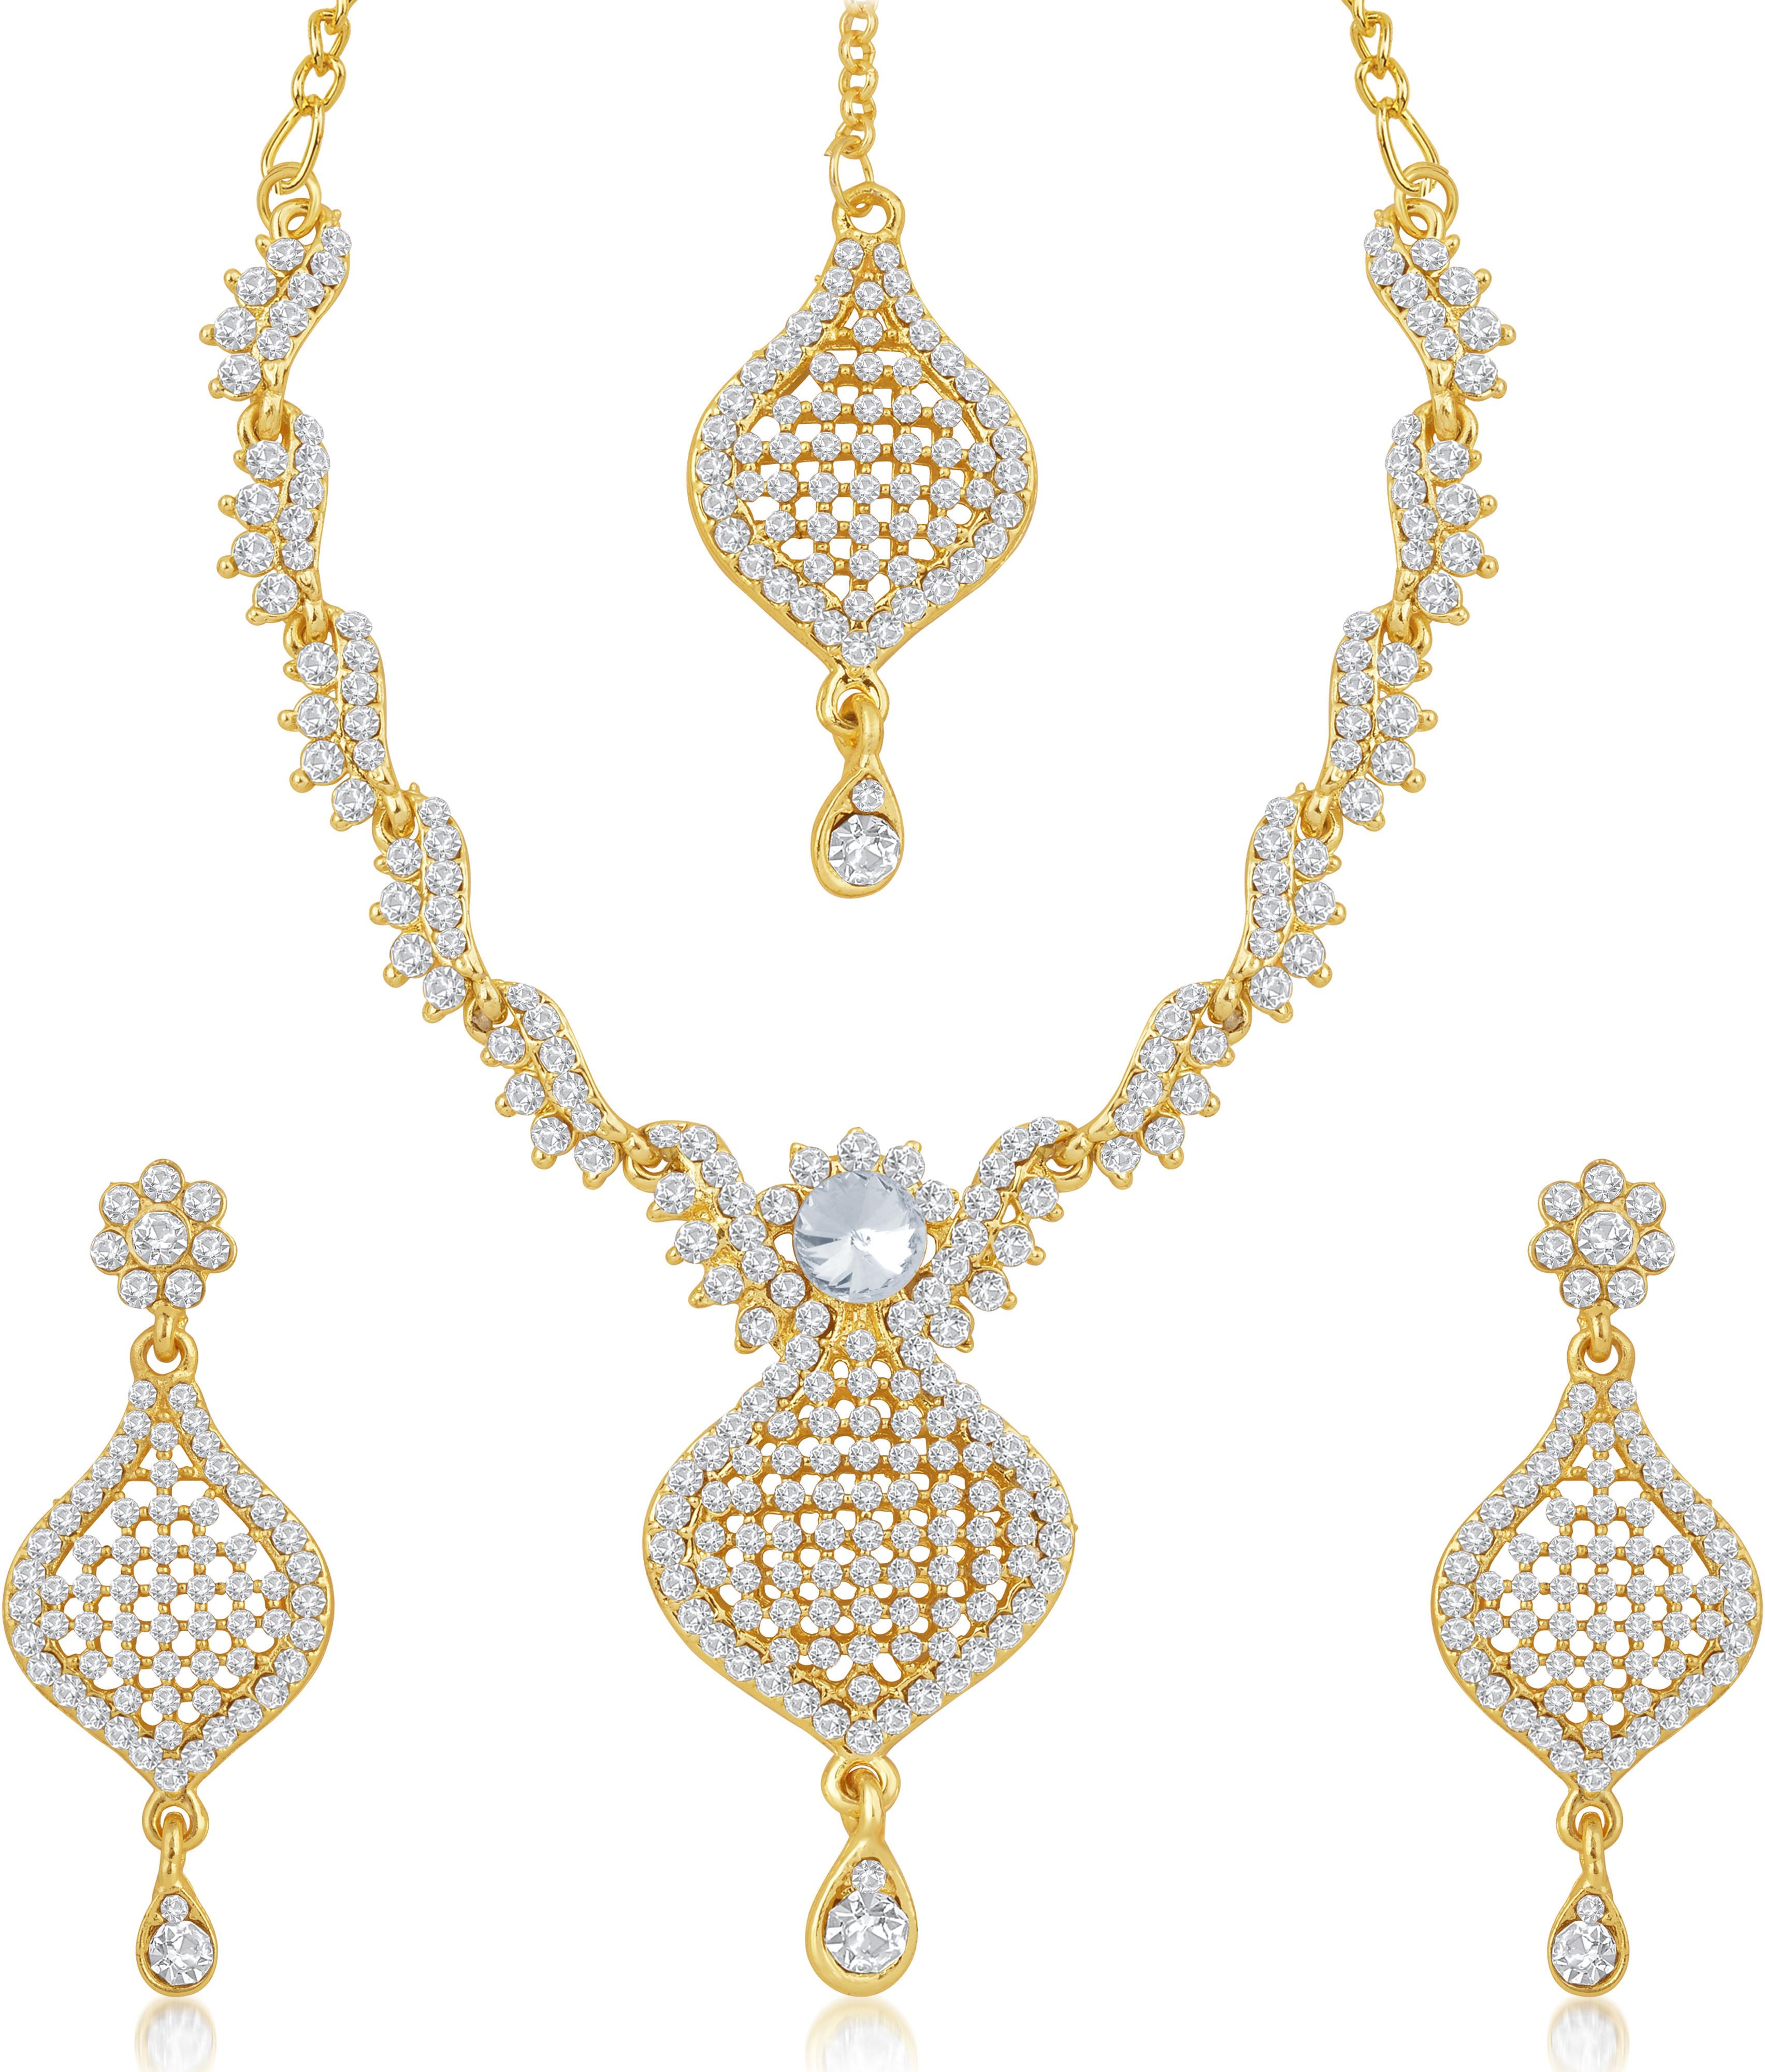 Deals - Delhi - Bracelets, Rings.. <br> Fashion Jewellery<br> Category - jewellery<br> Business - Flipkart.com